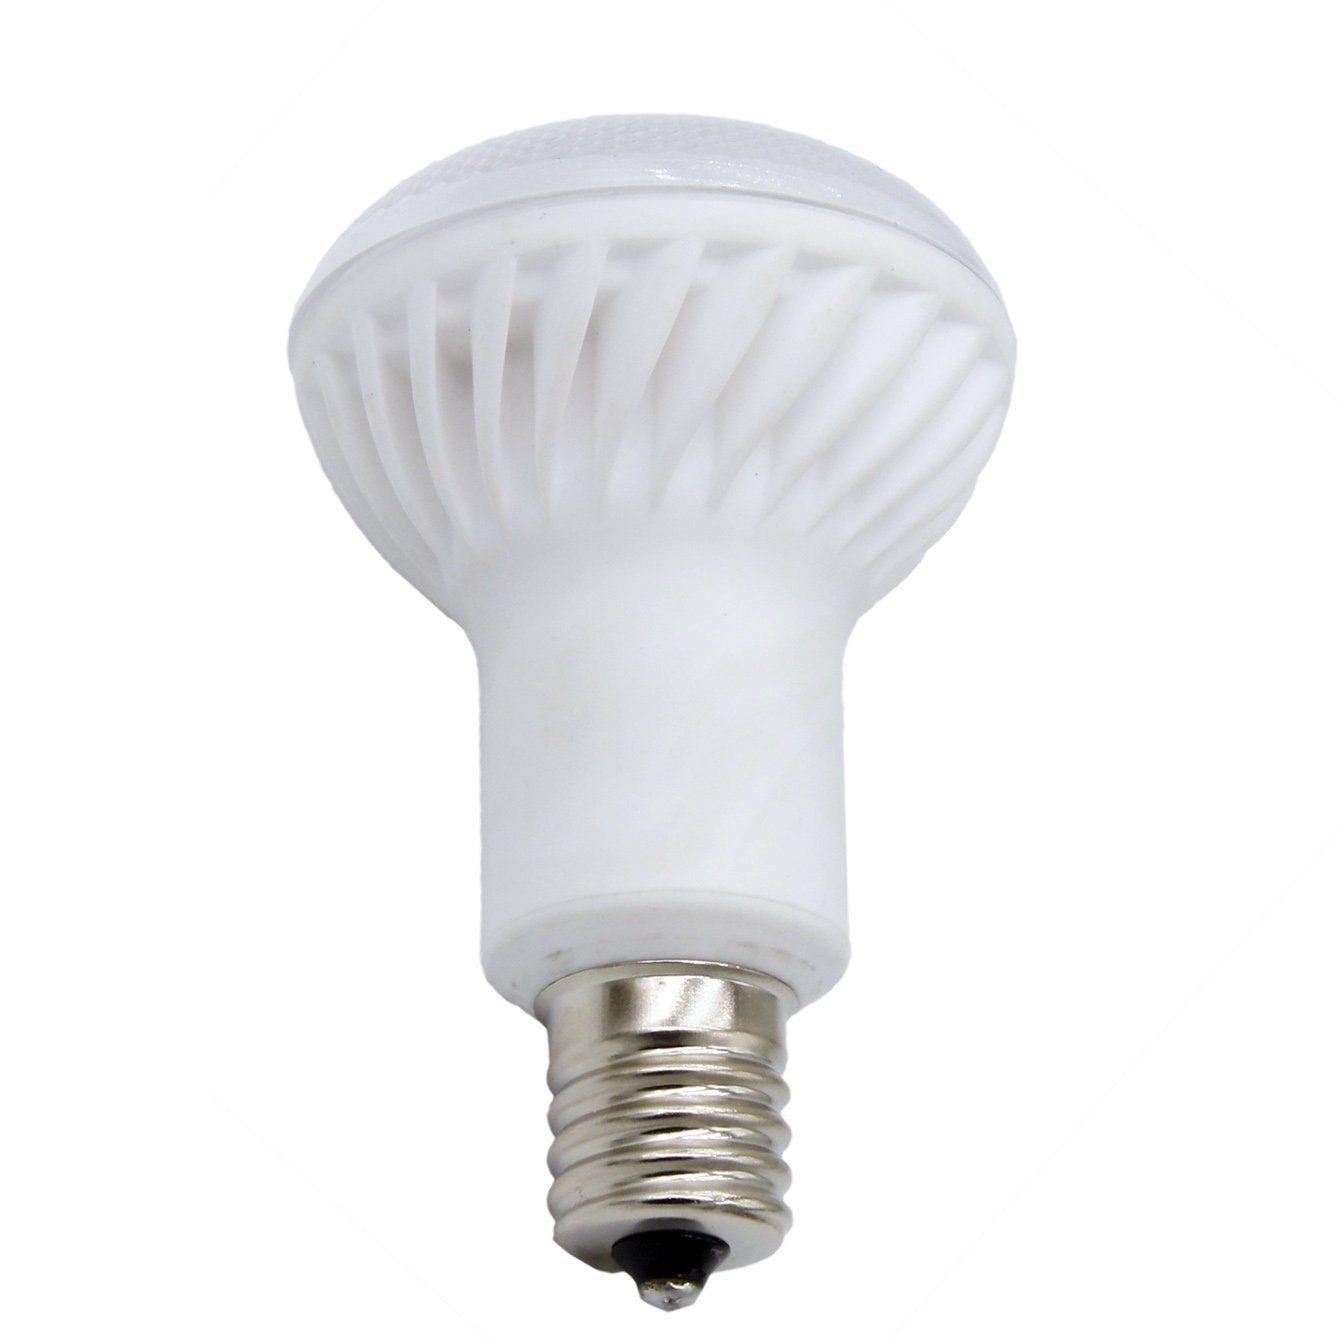 E17 R14 전구 온난한 백색, 2700K 의 중간 기초, 120 볼트는, 40 와트 중간 기본적인 실내 플러드 전구를 같게 한다